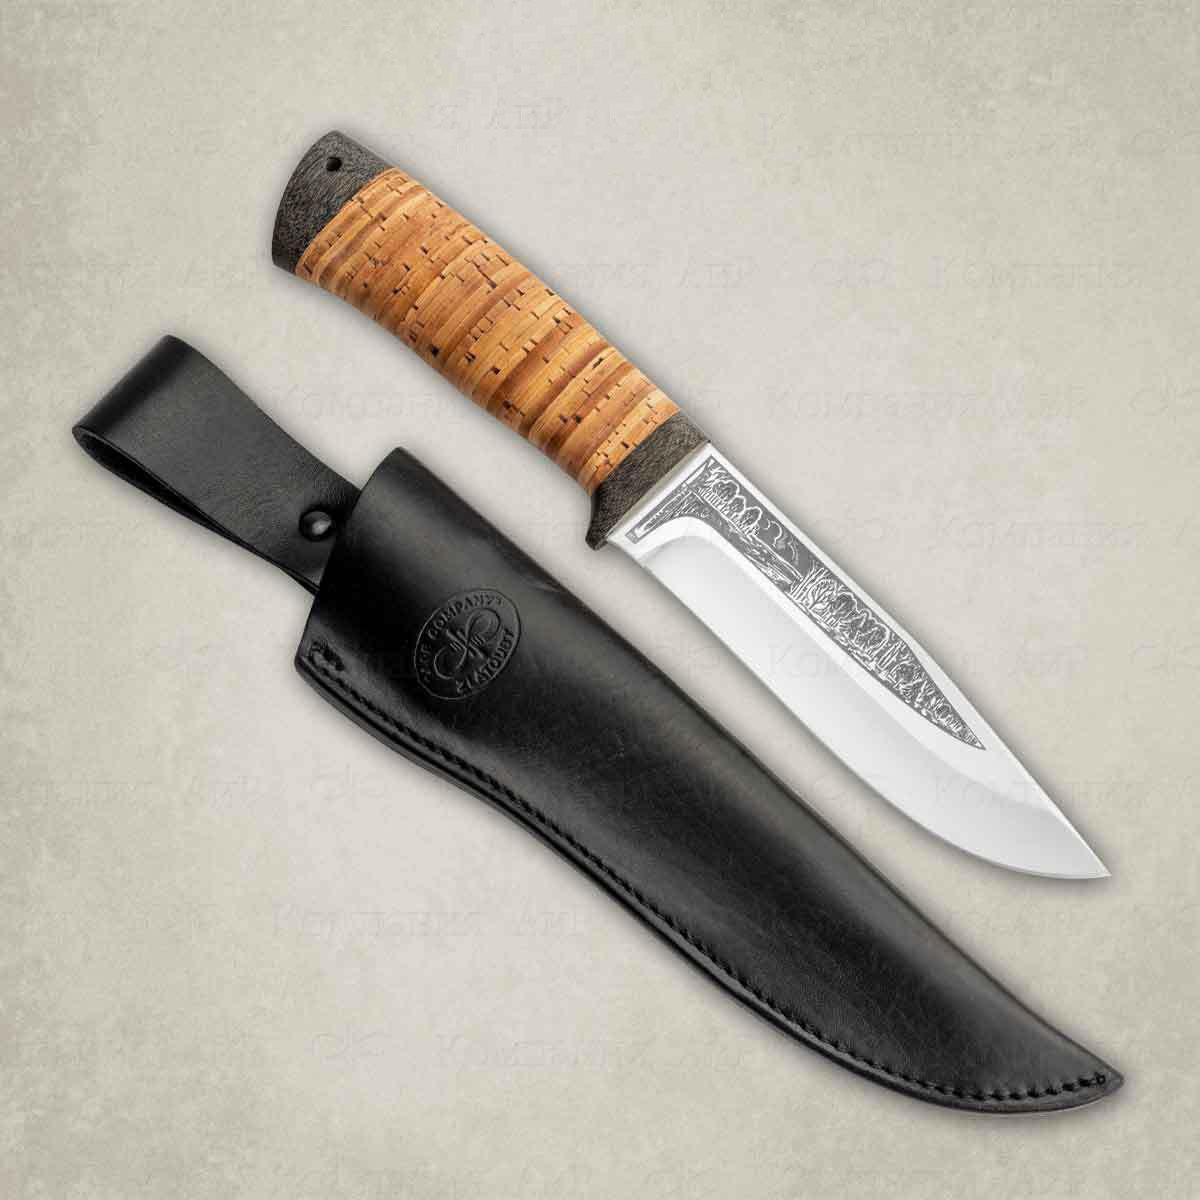 Нож АиР Турист, сталь ЭП-766, рукоять береста недорого